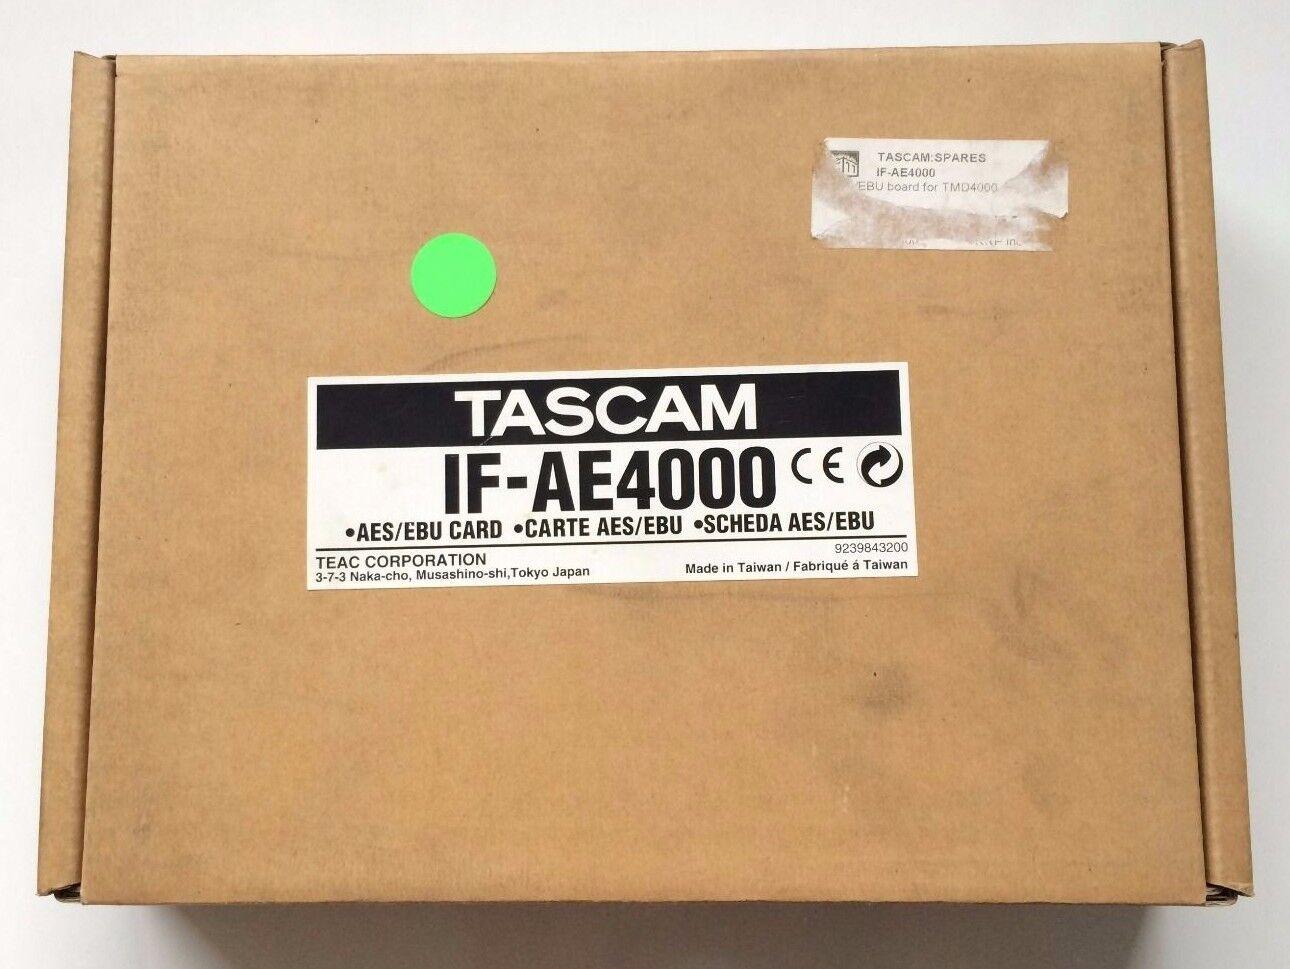 Tascam IF-AE4000 AES BEU Card